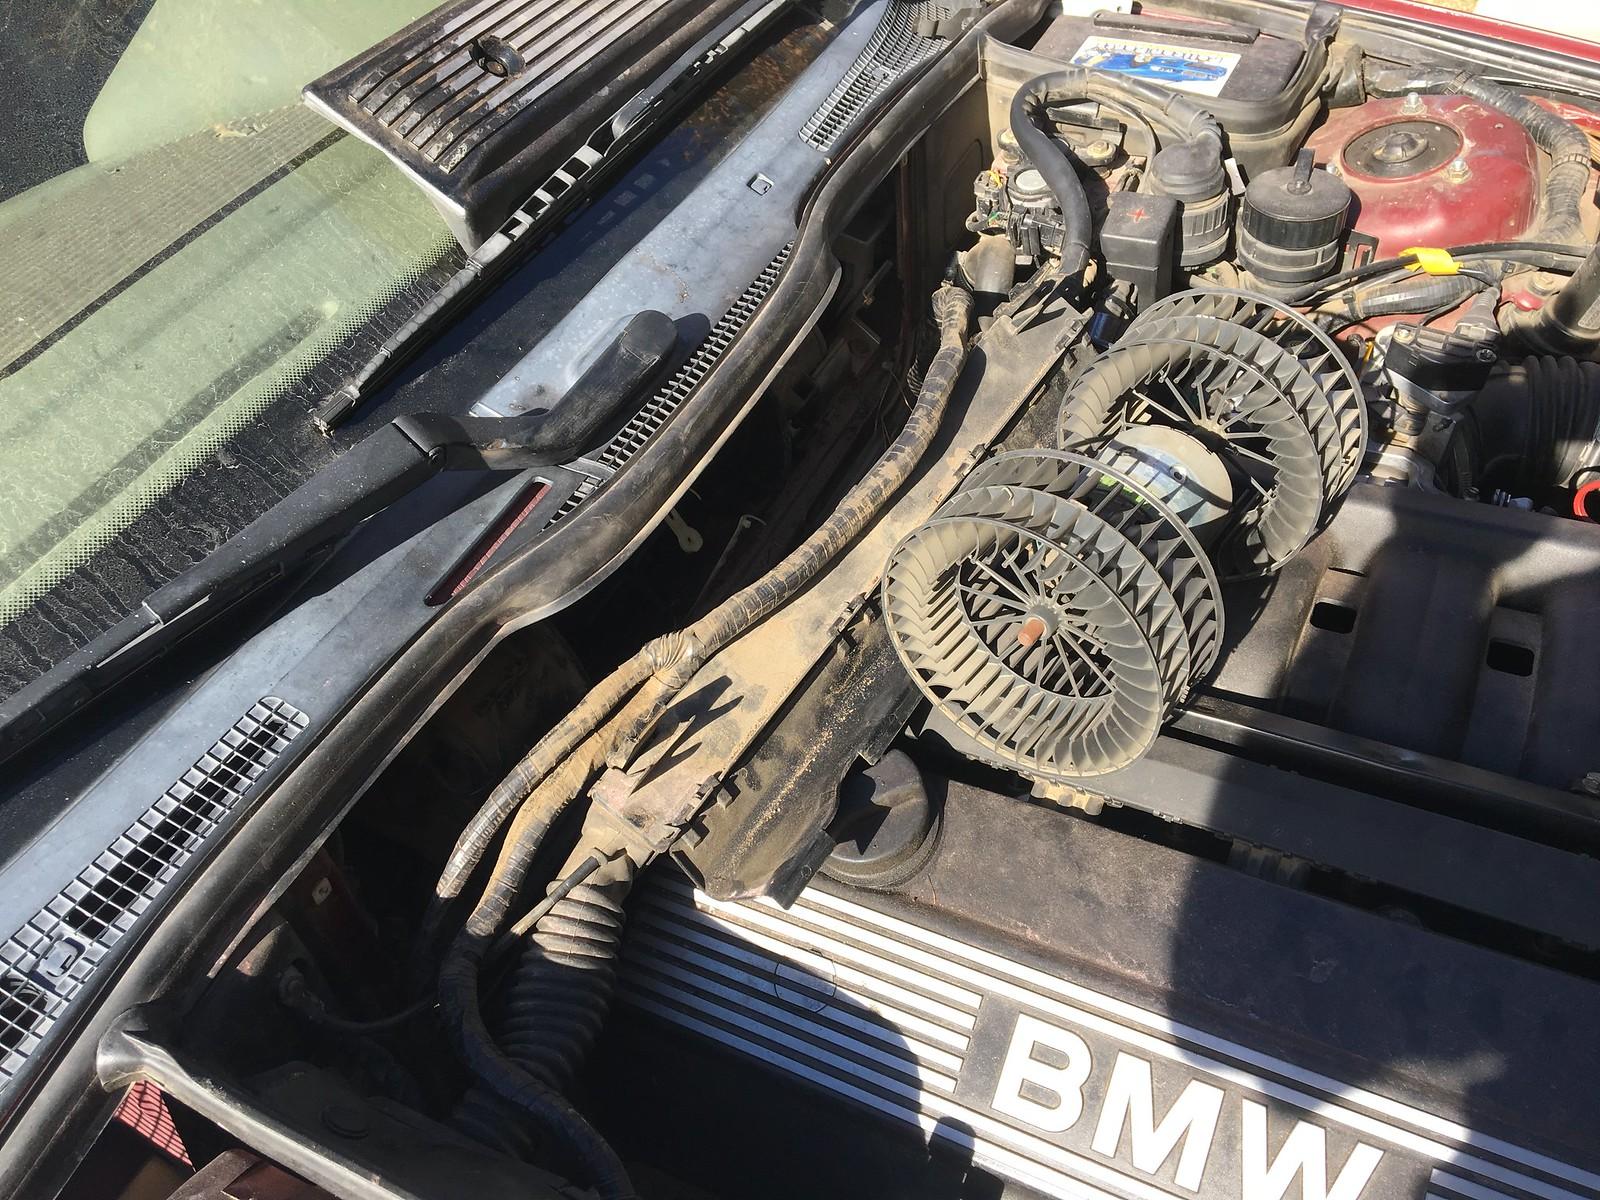 30 Amp Blower Fuse Blown